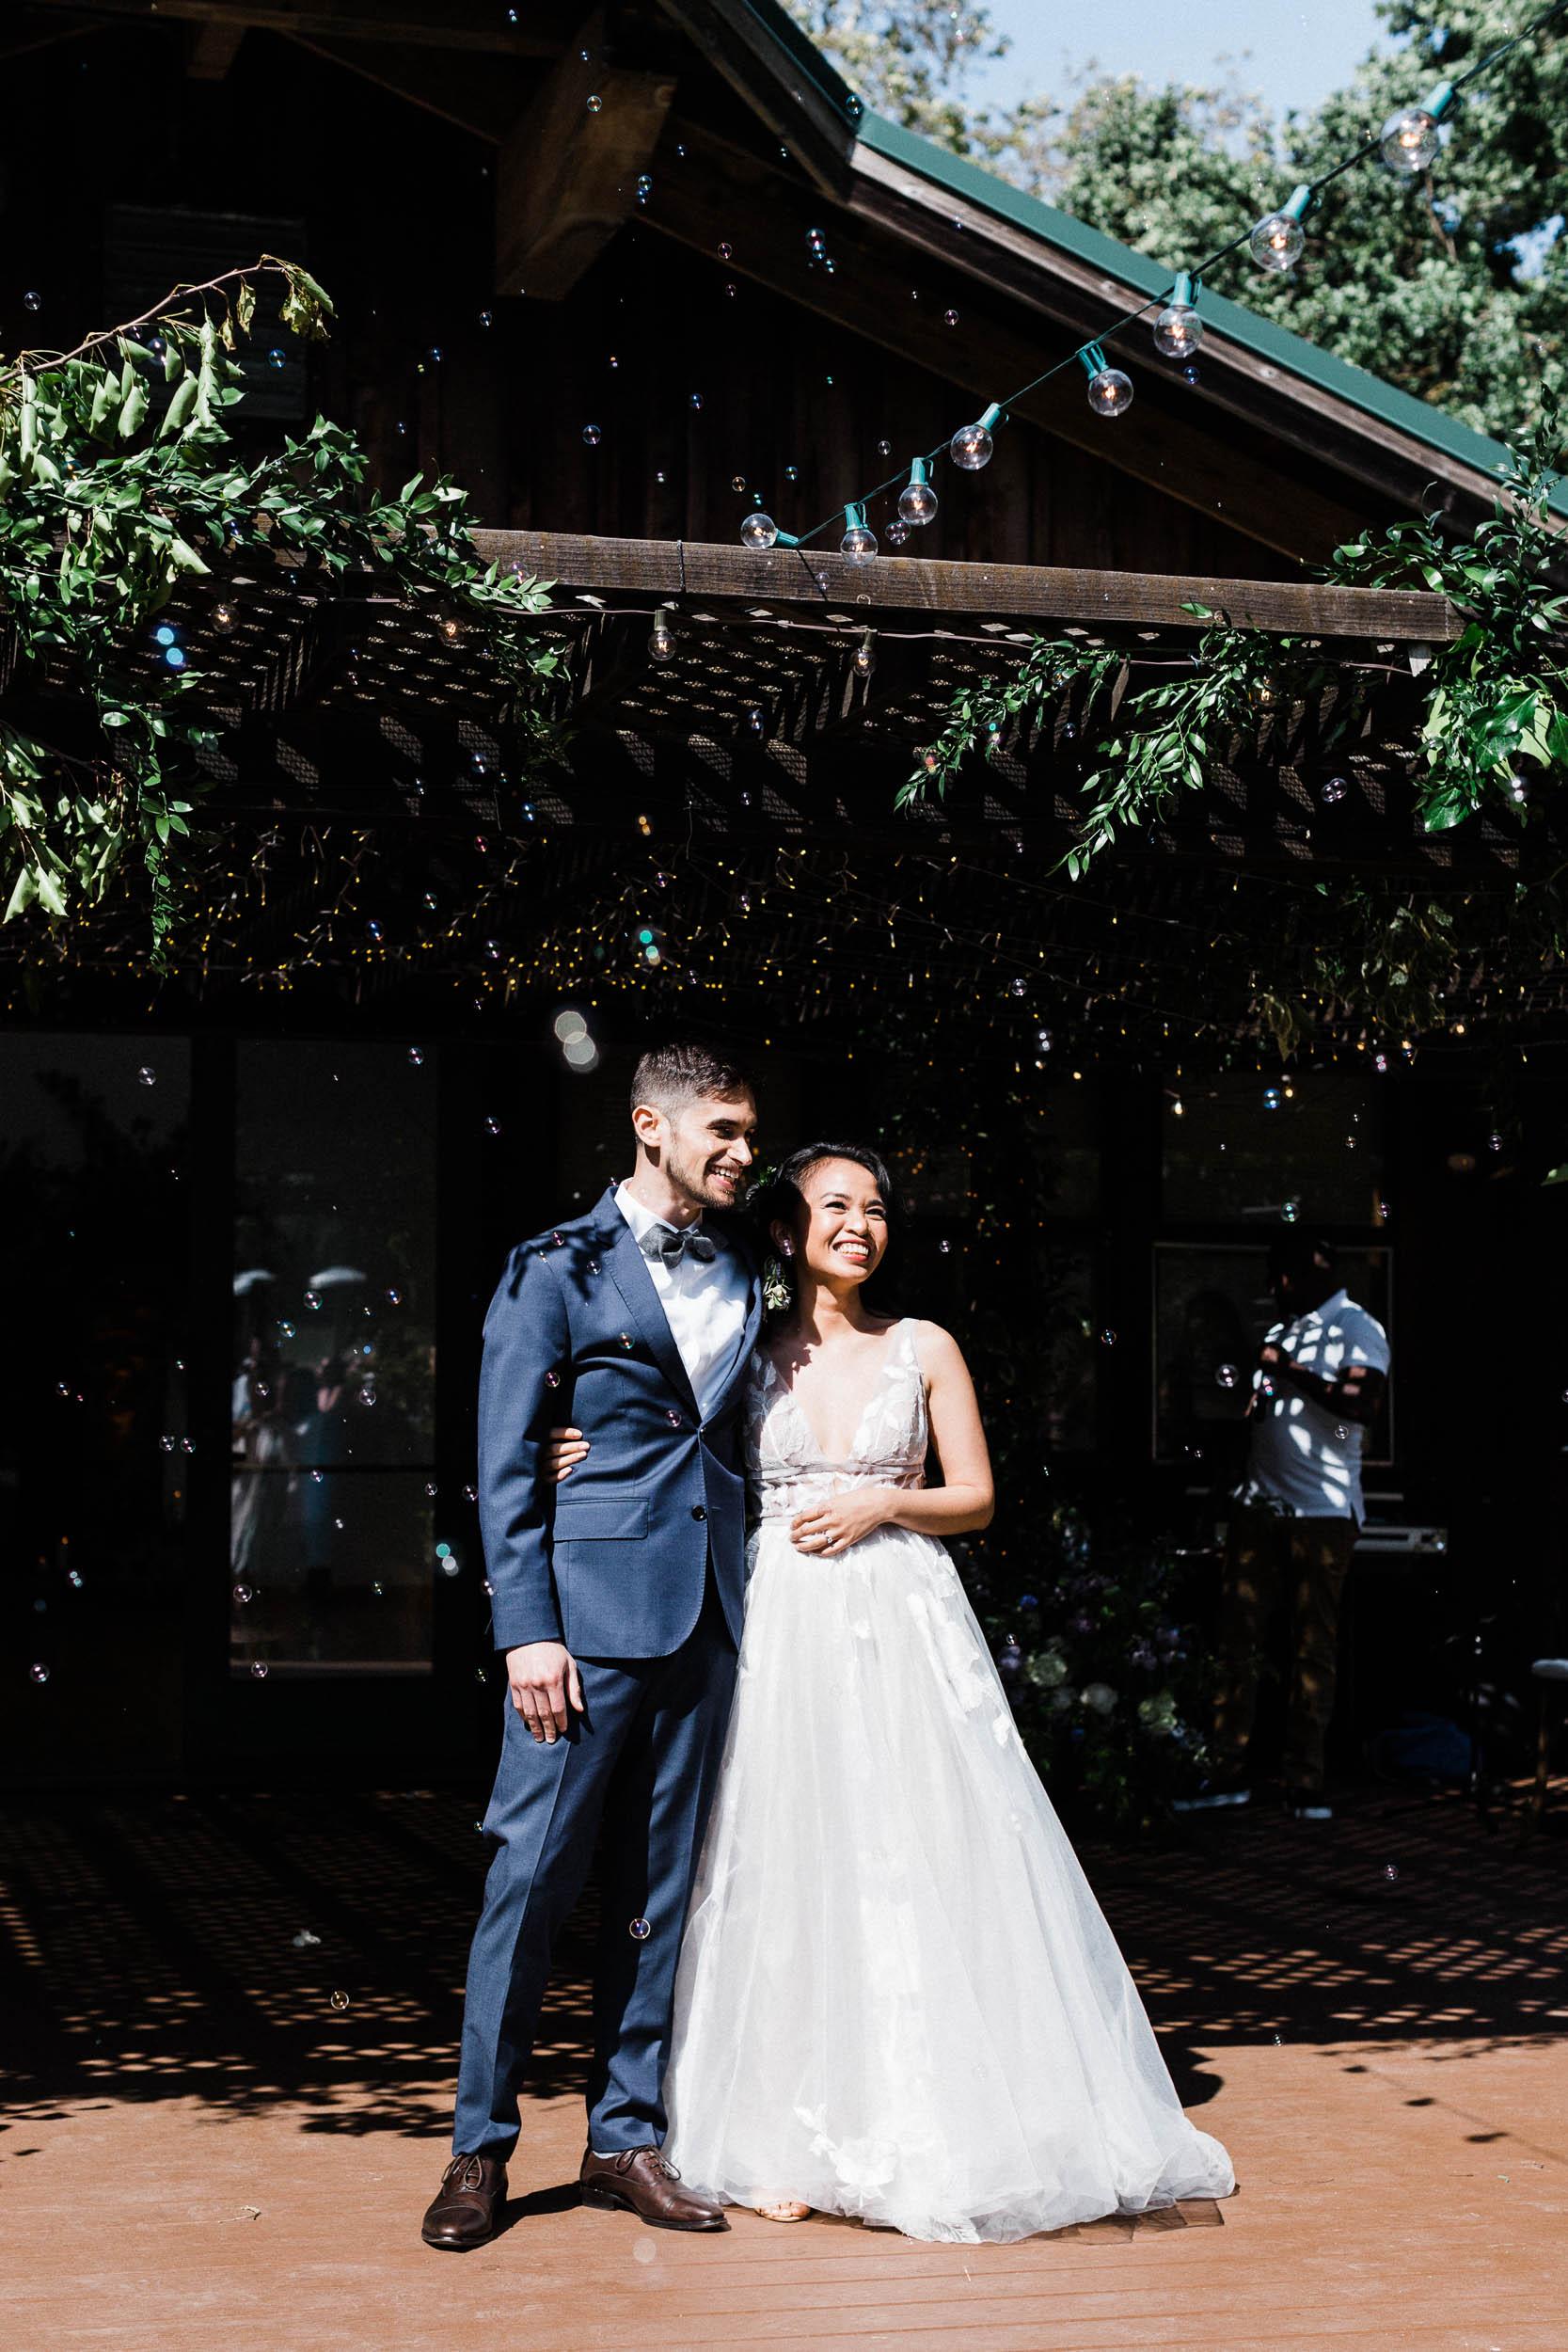 052519_B+S_Hidden Villa Wedding_Buena Lane Photography_052519_0630CY.jpg